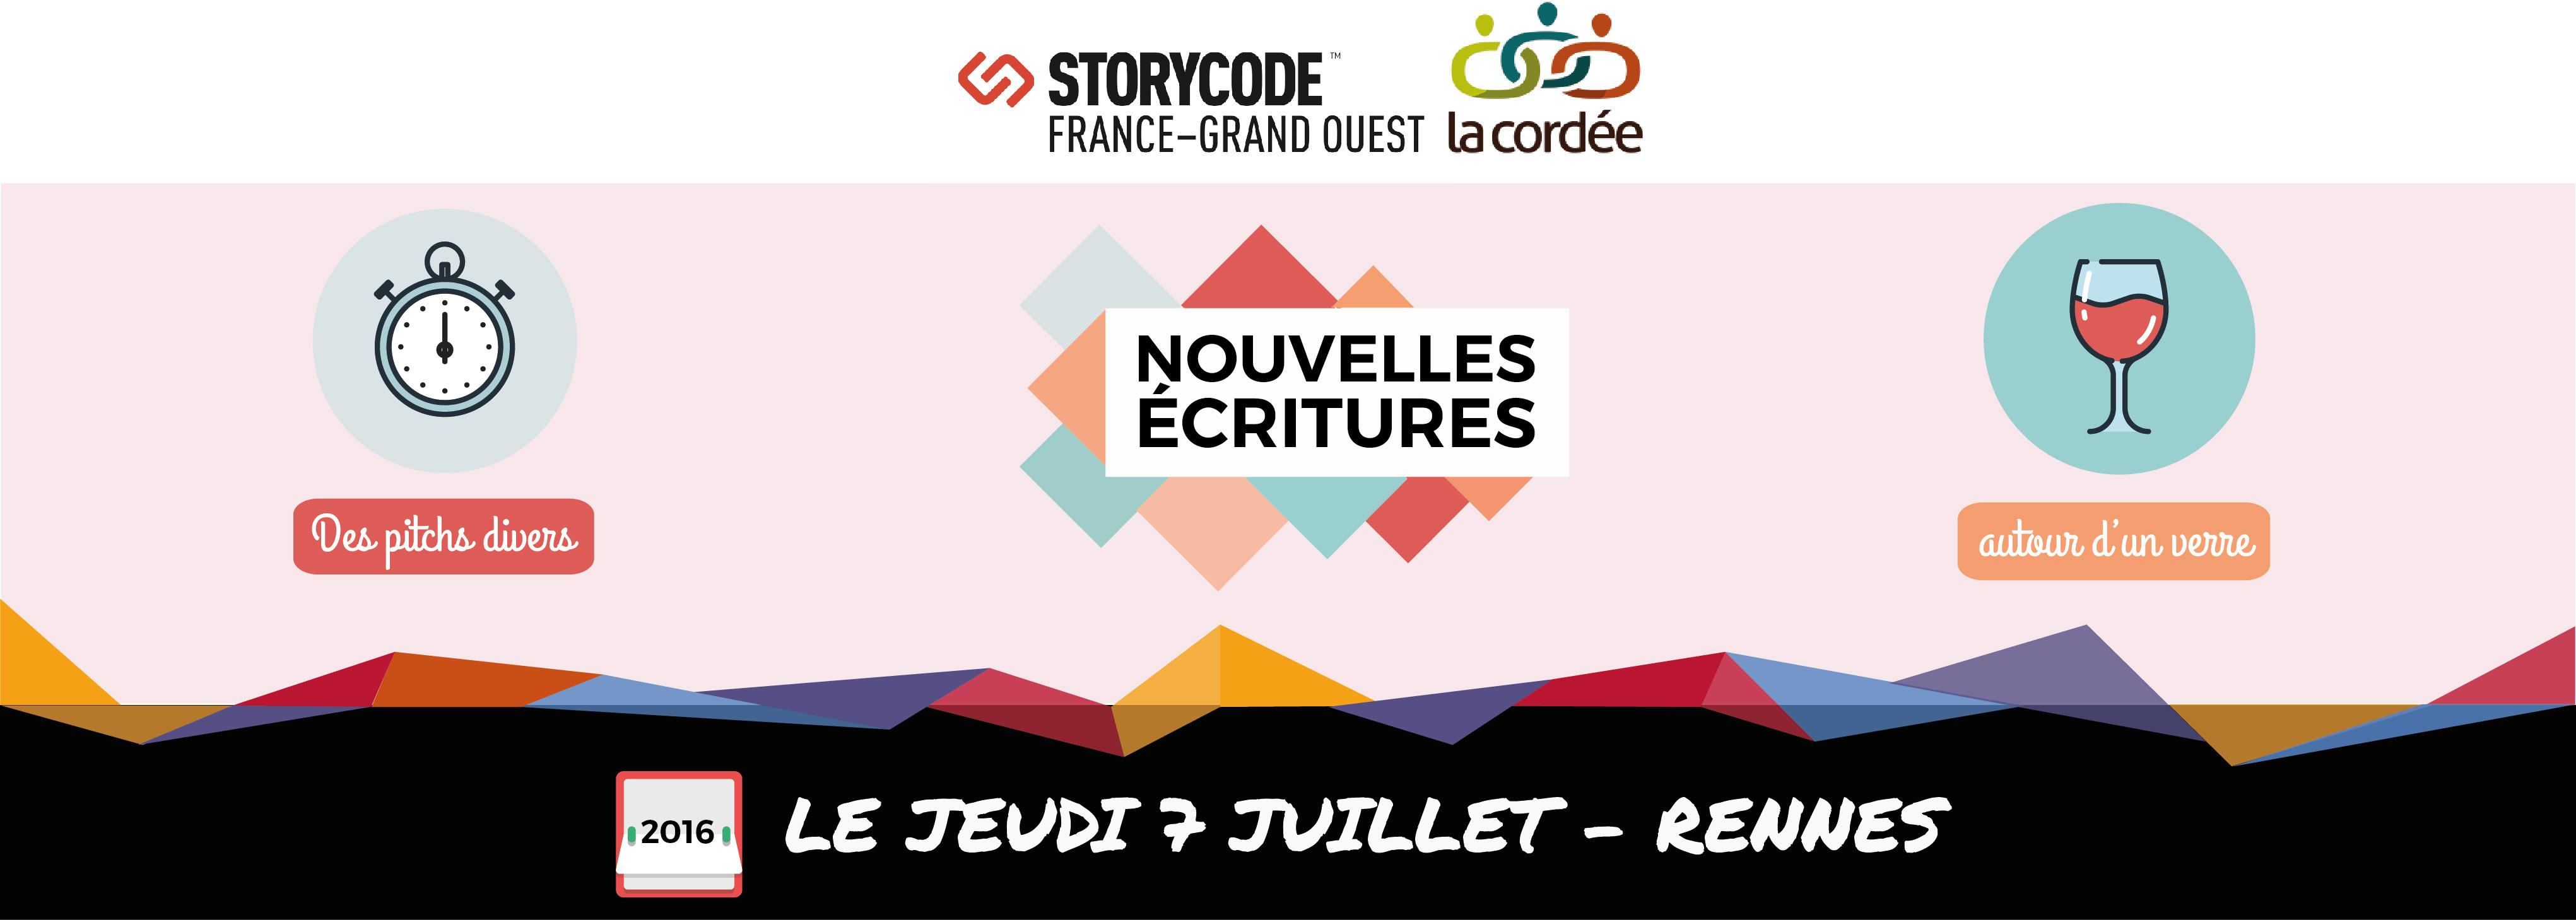 storycode-rennes-7-juillet